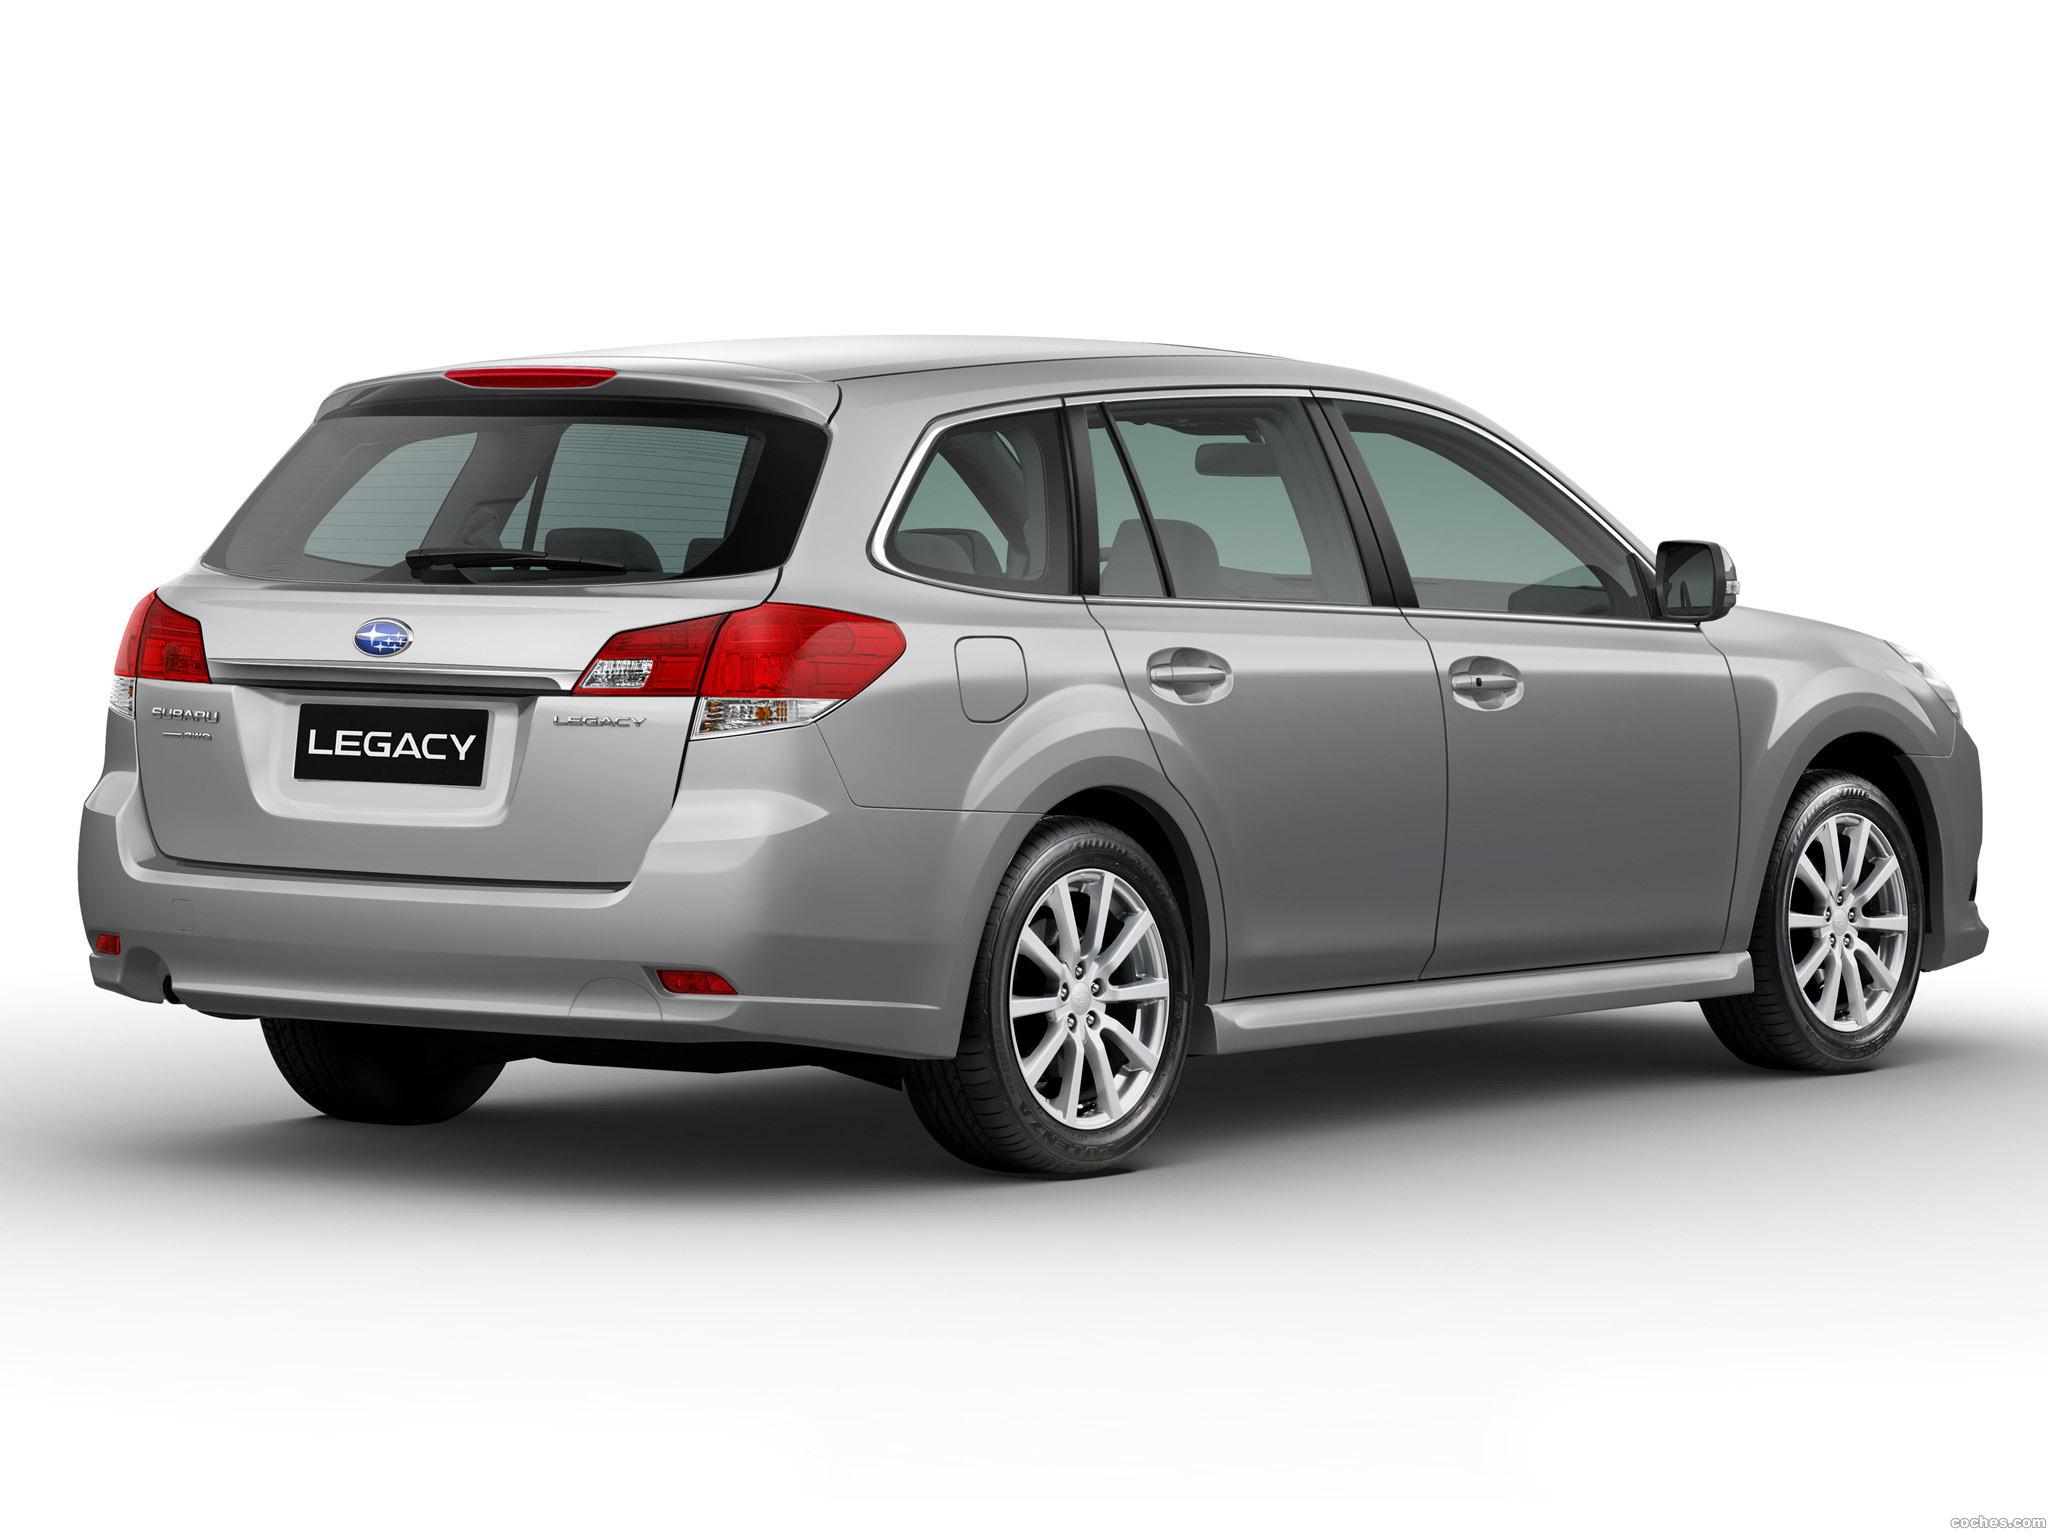 Foto 1 de Subaru Legacy SW Europe 2009